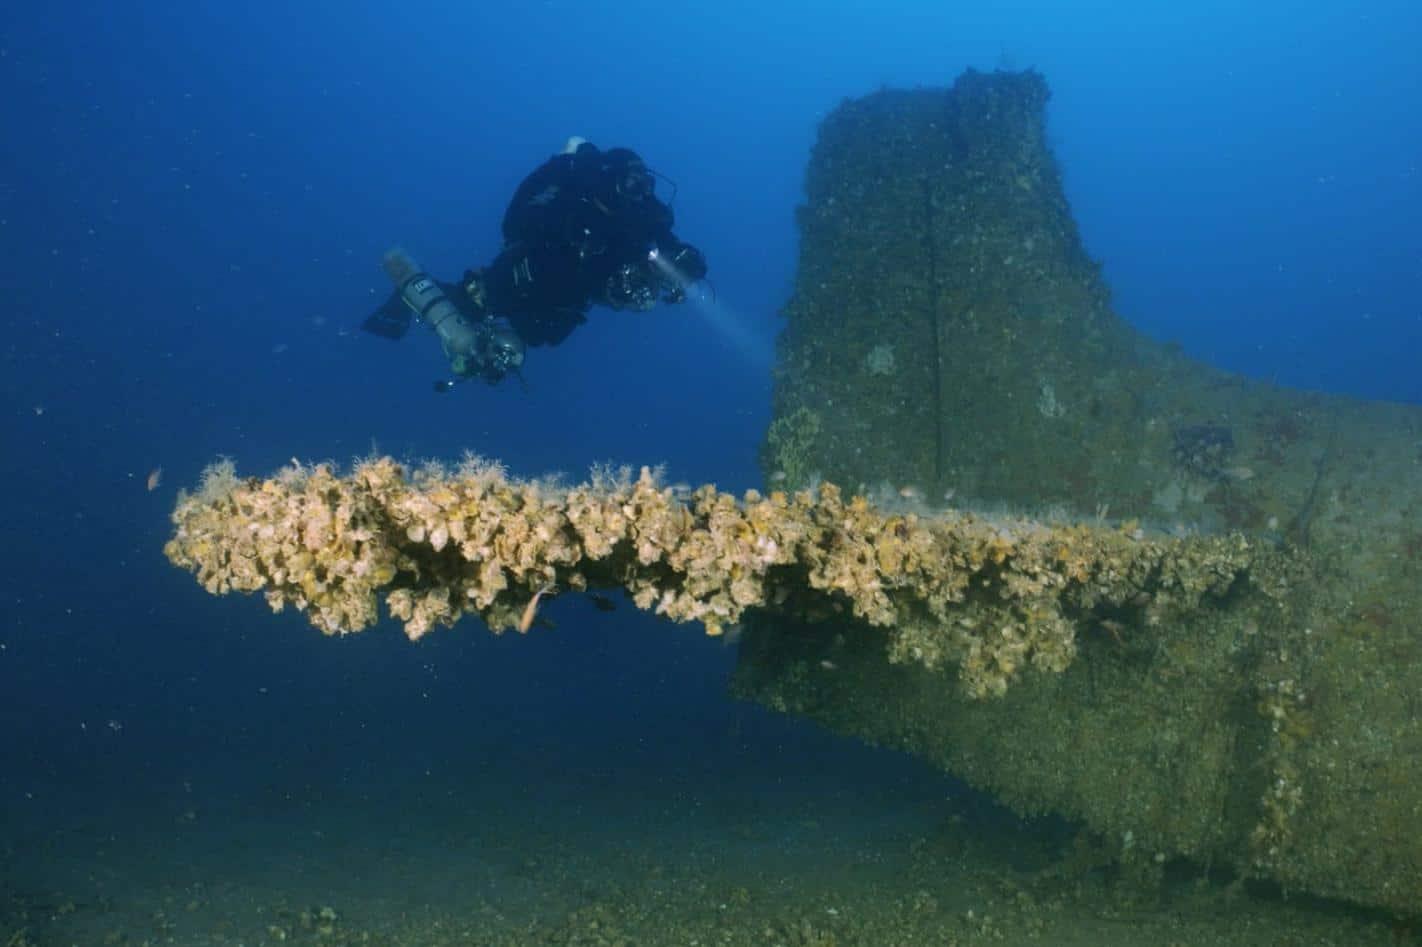 wrak Douglas A-1 Skyraider divers24.pl